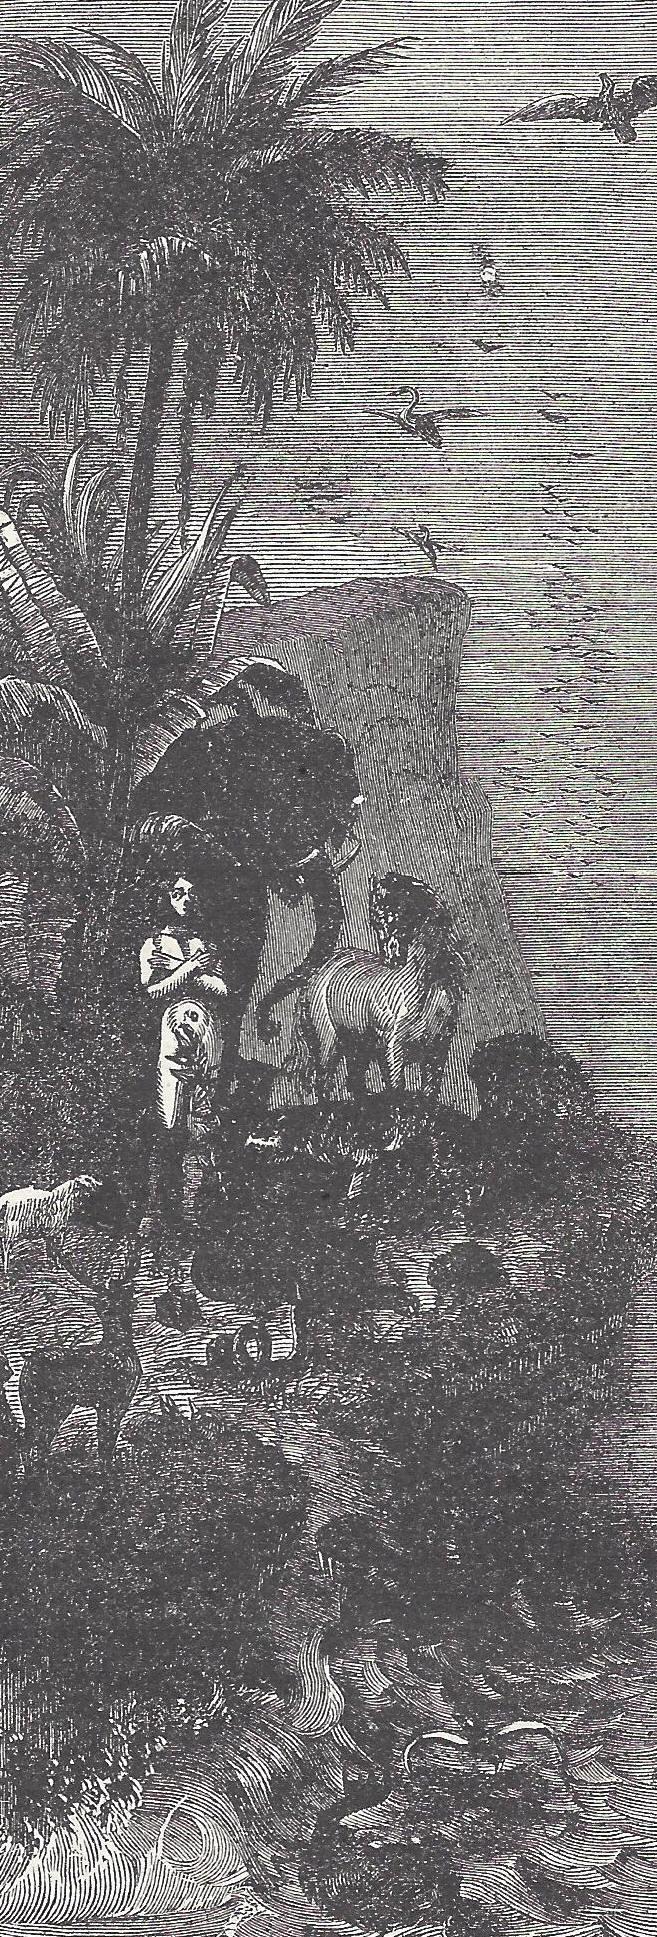 Adam at the Biblical Creation - Garden of Eden